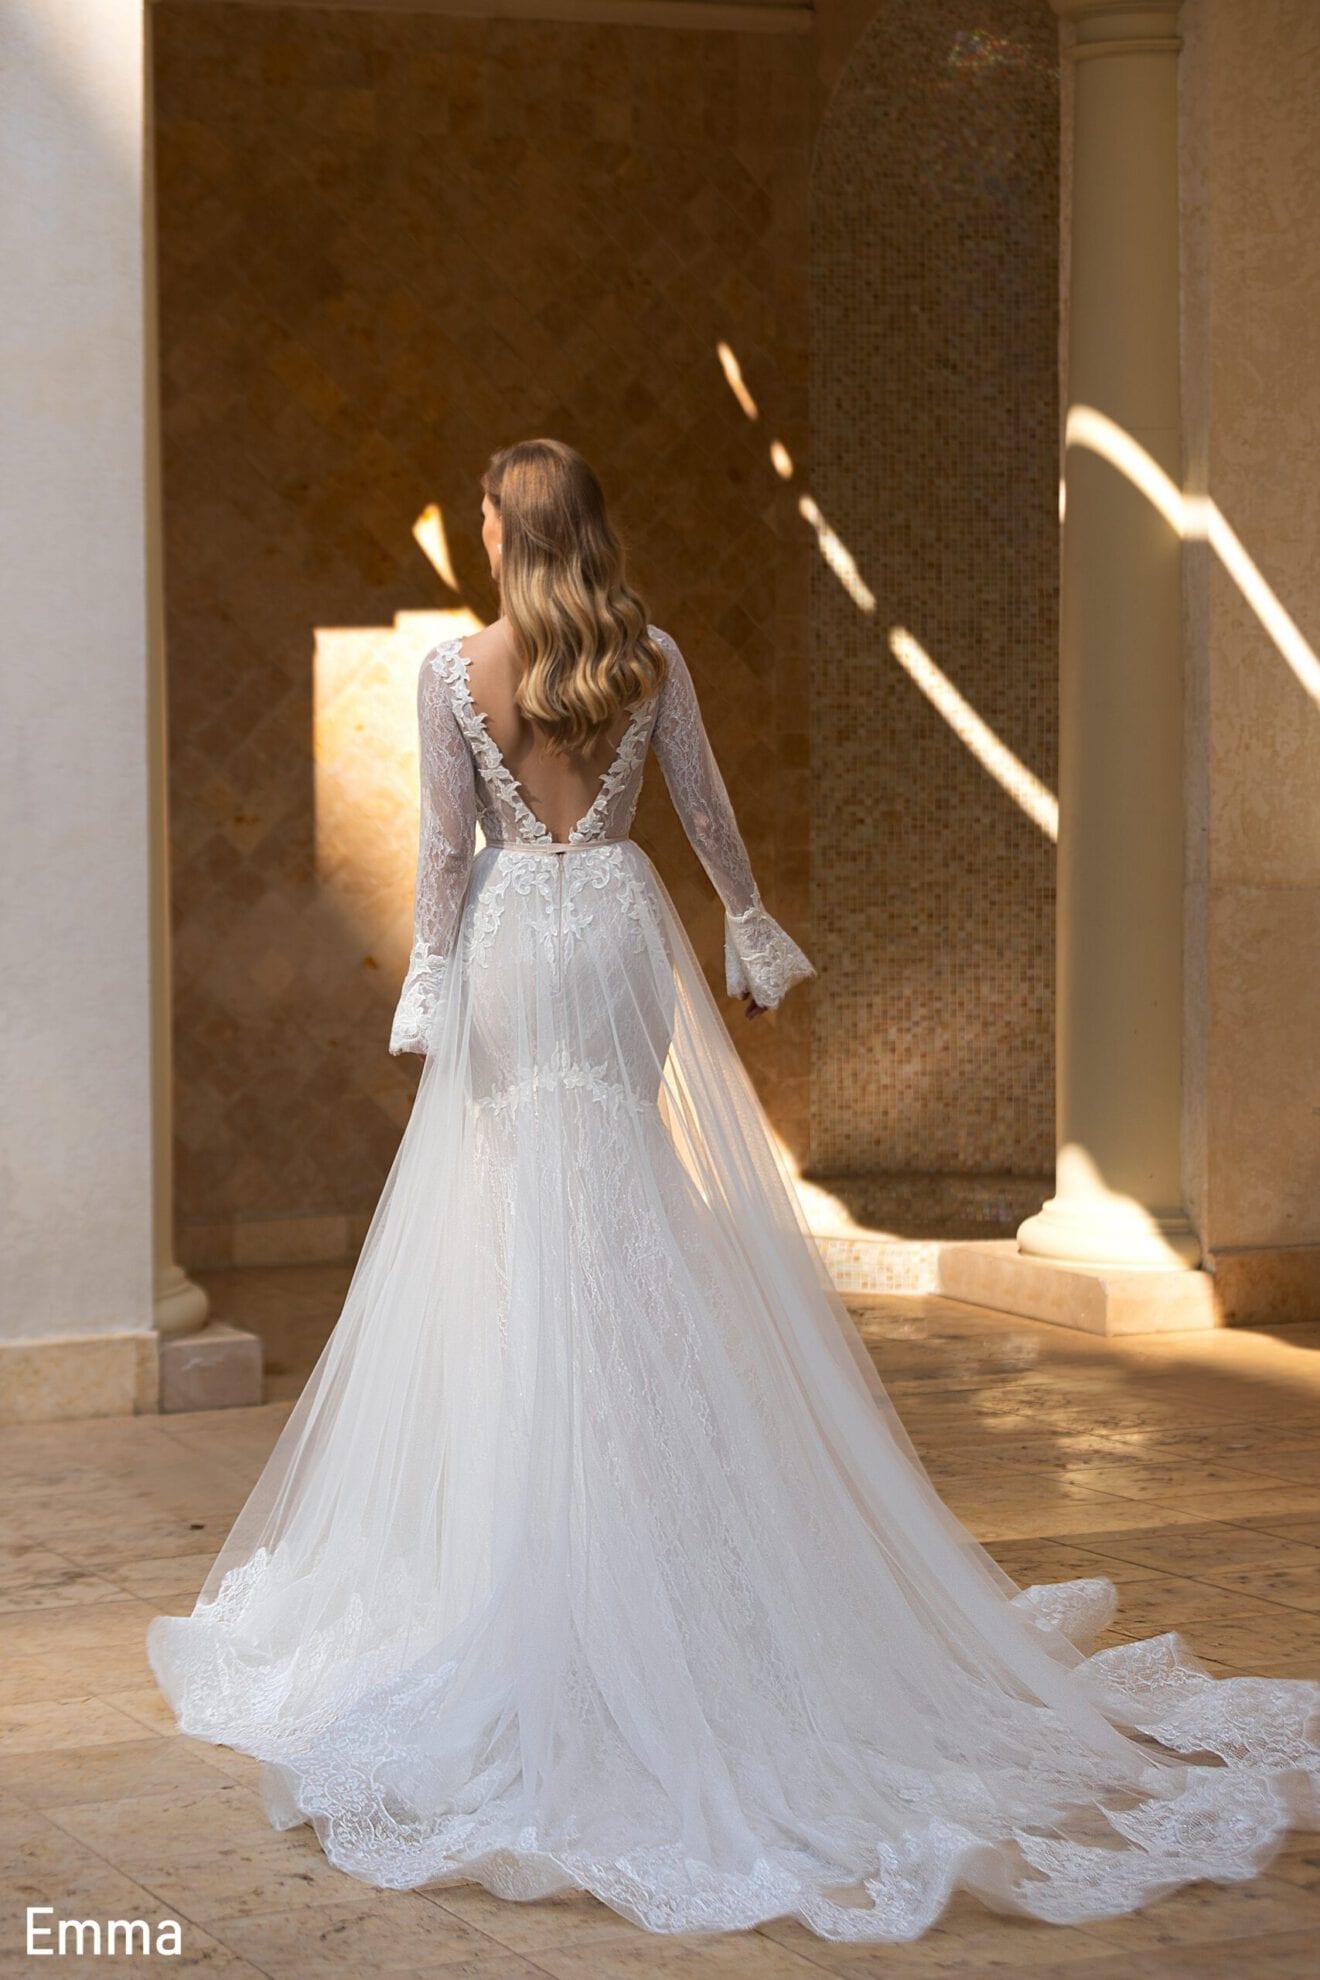 Hochzeitskleid Meerjungfrau mit separatem Rock